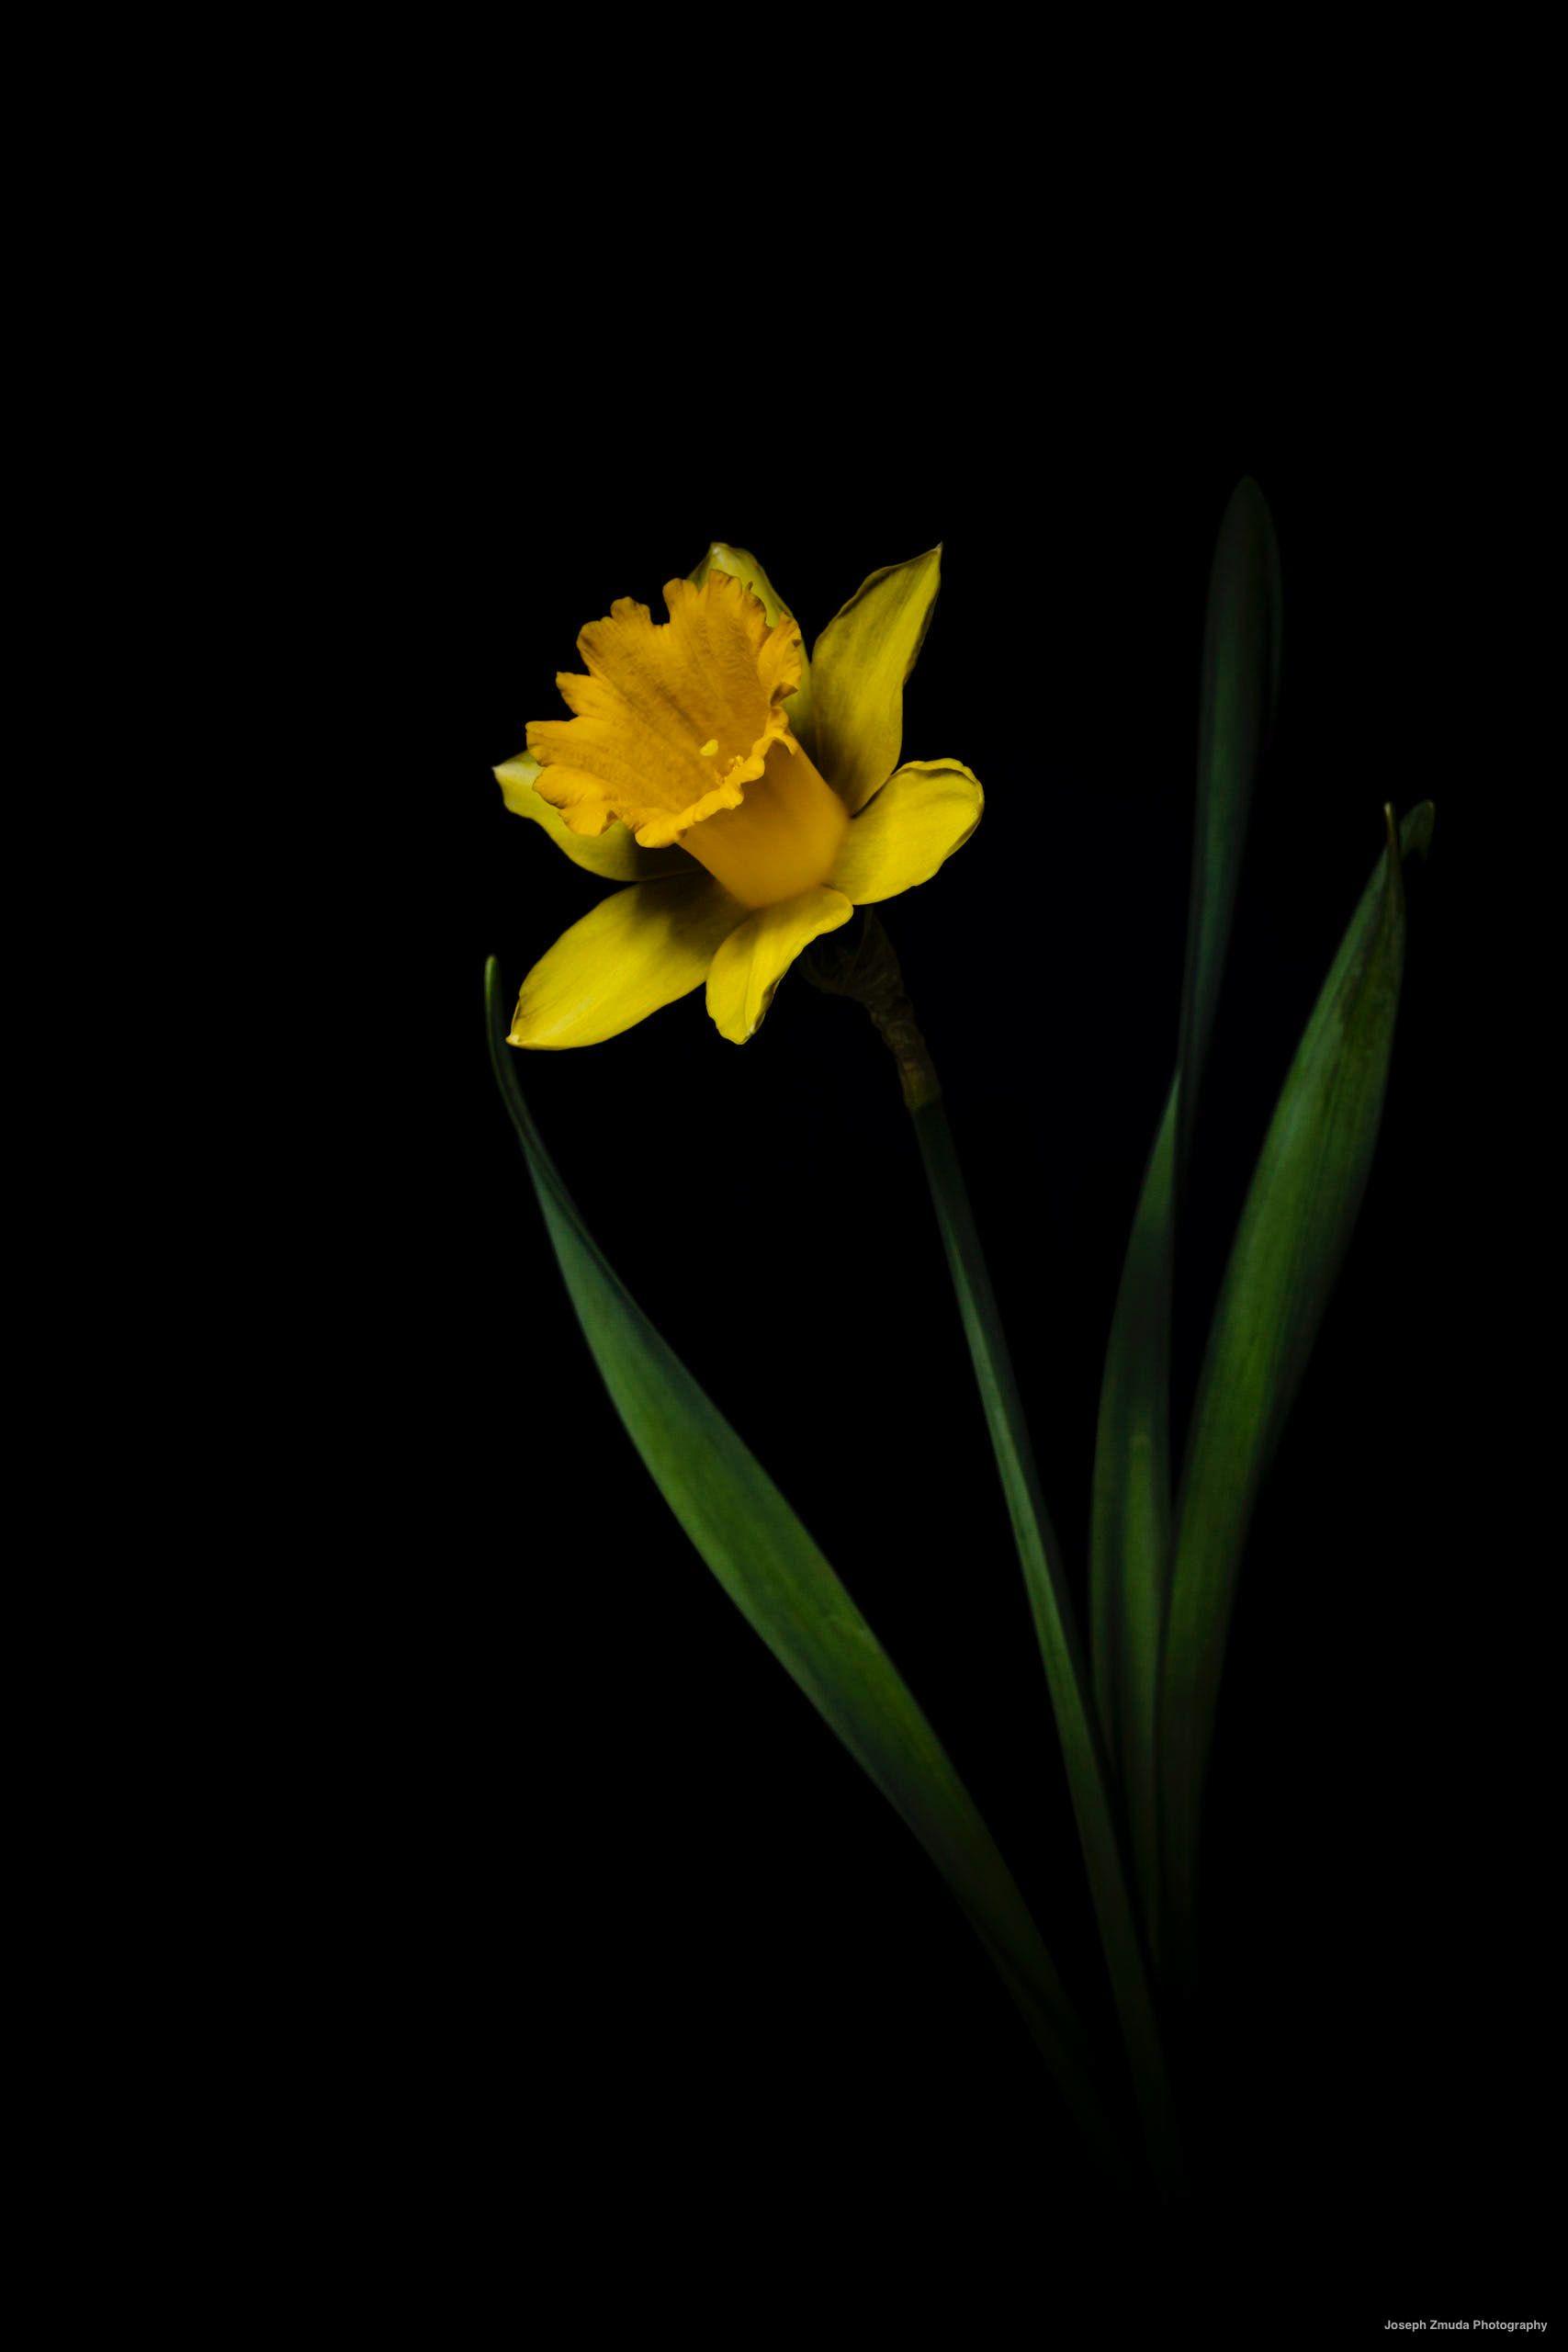 Daffodil Flowers Plants Photography Photographers Macro Macrophotography Macrophotograph Fl In 2020 Daffodil Photography Macro Photography Flowers Daffodils